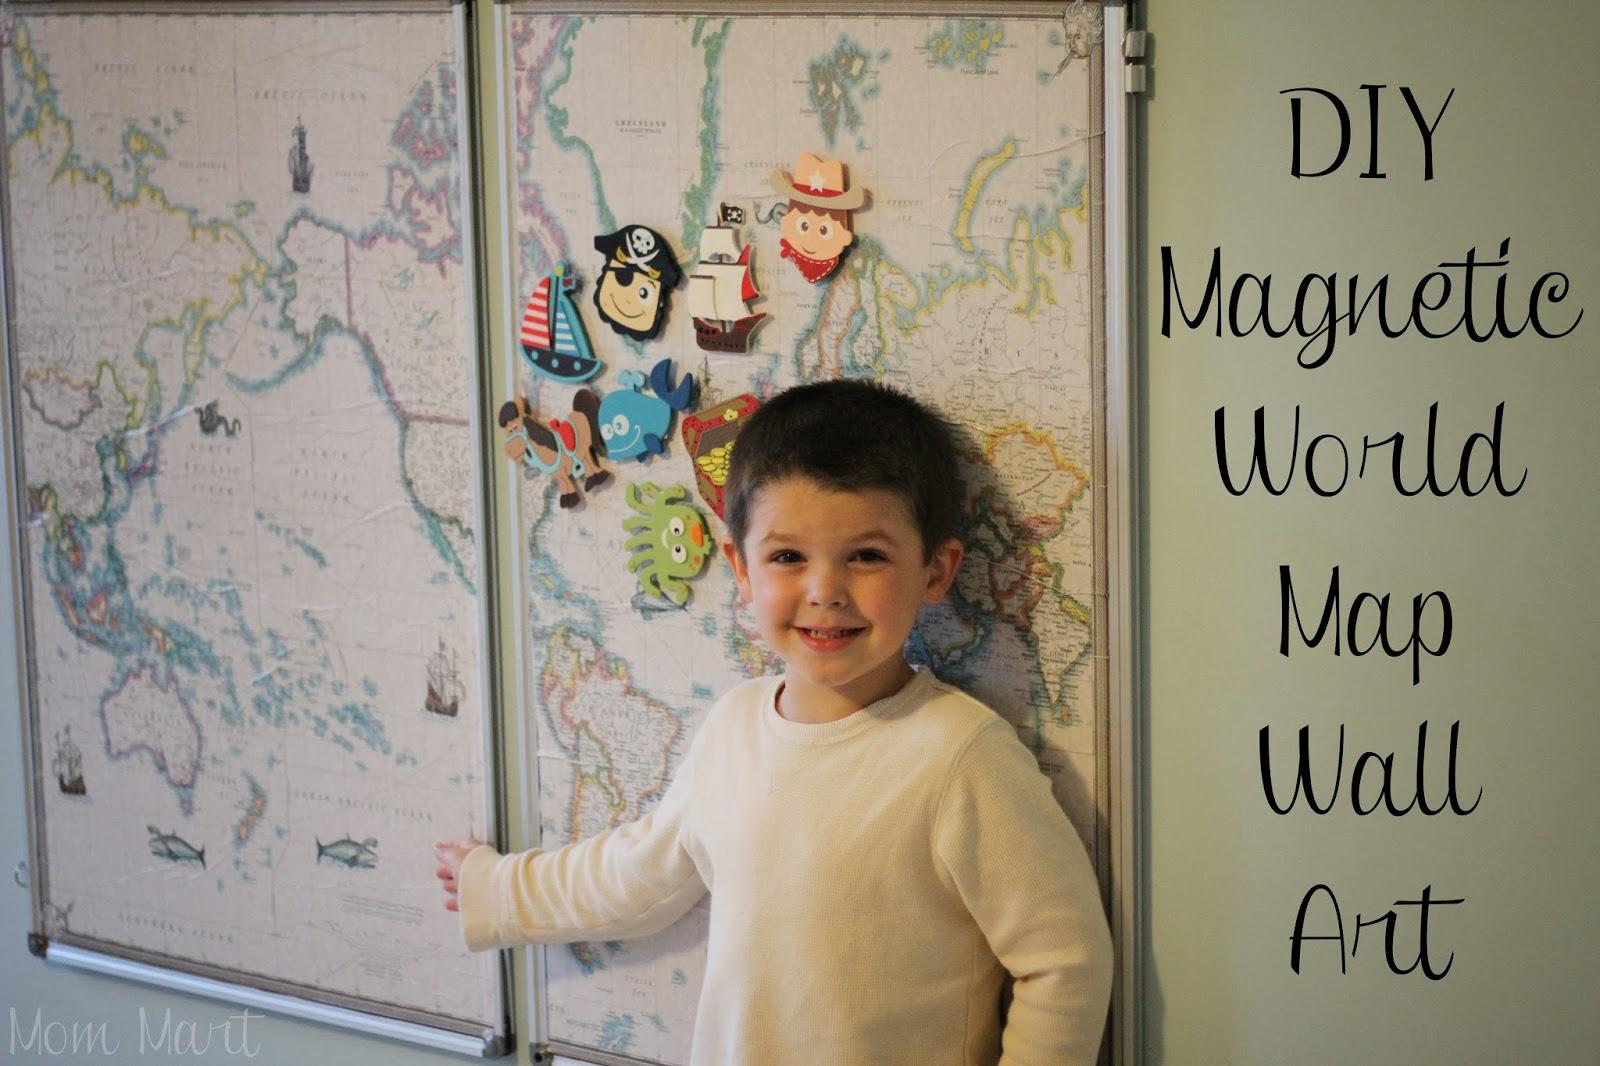 how to make an interactive world map wall art diy magnetic worldmap